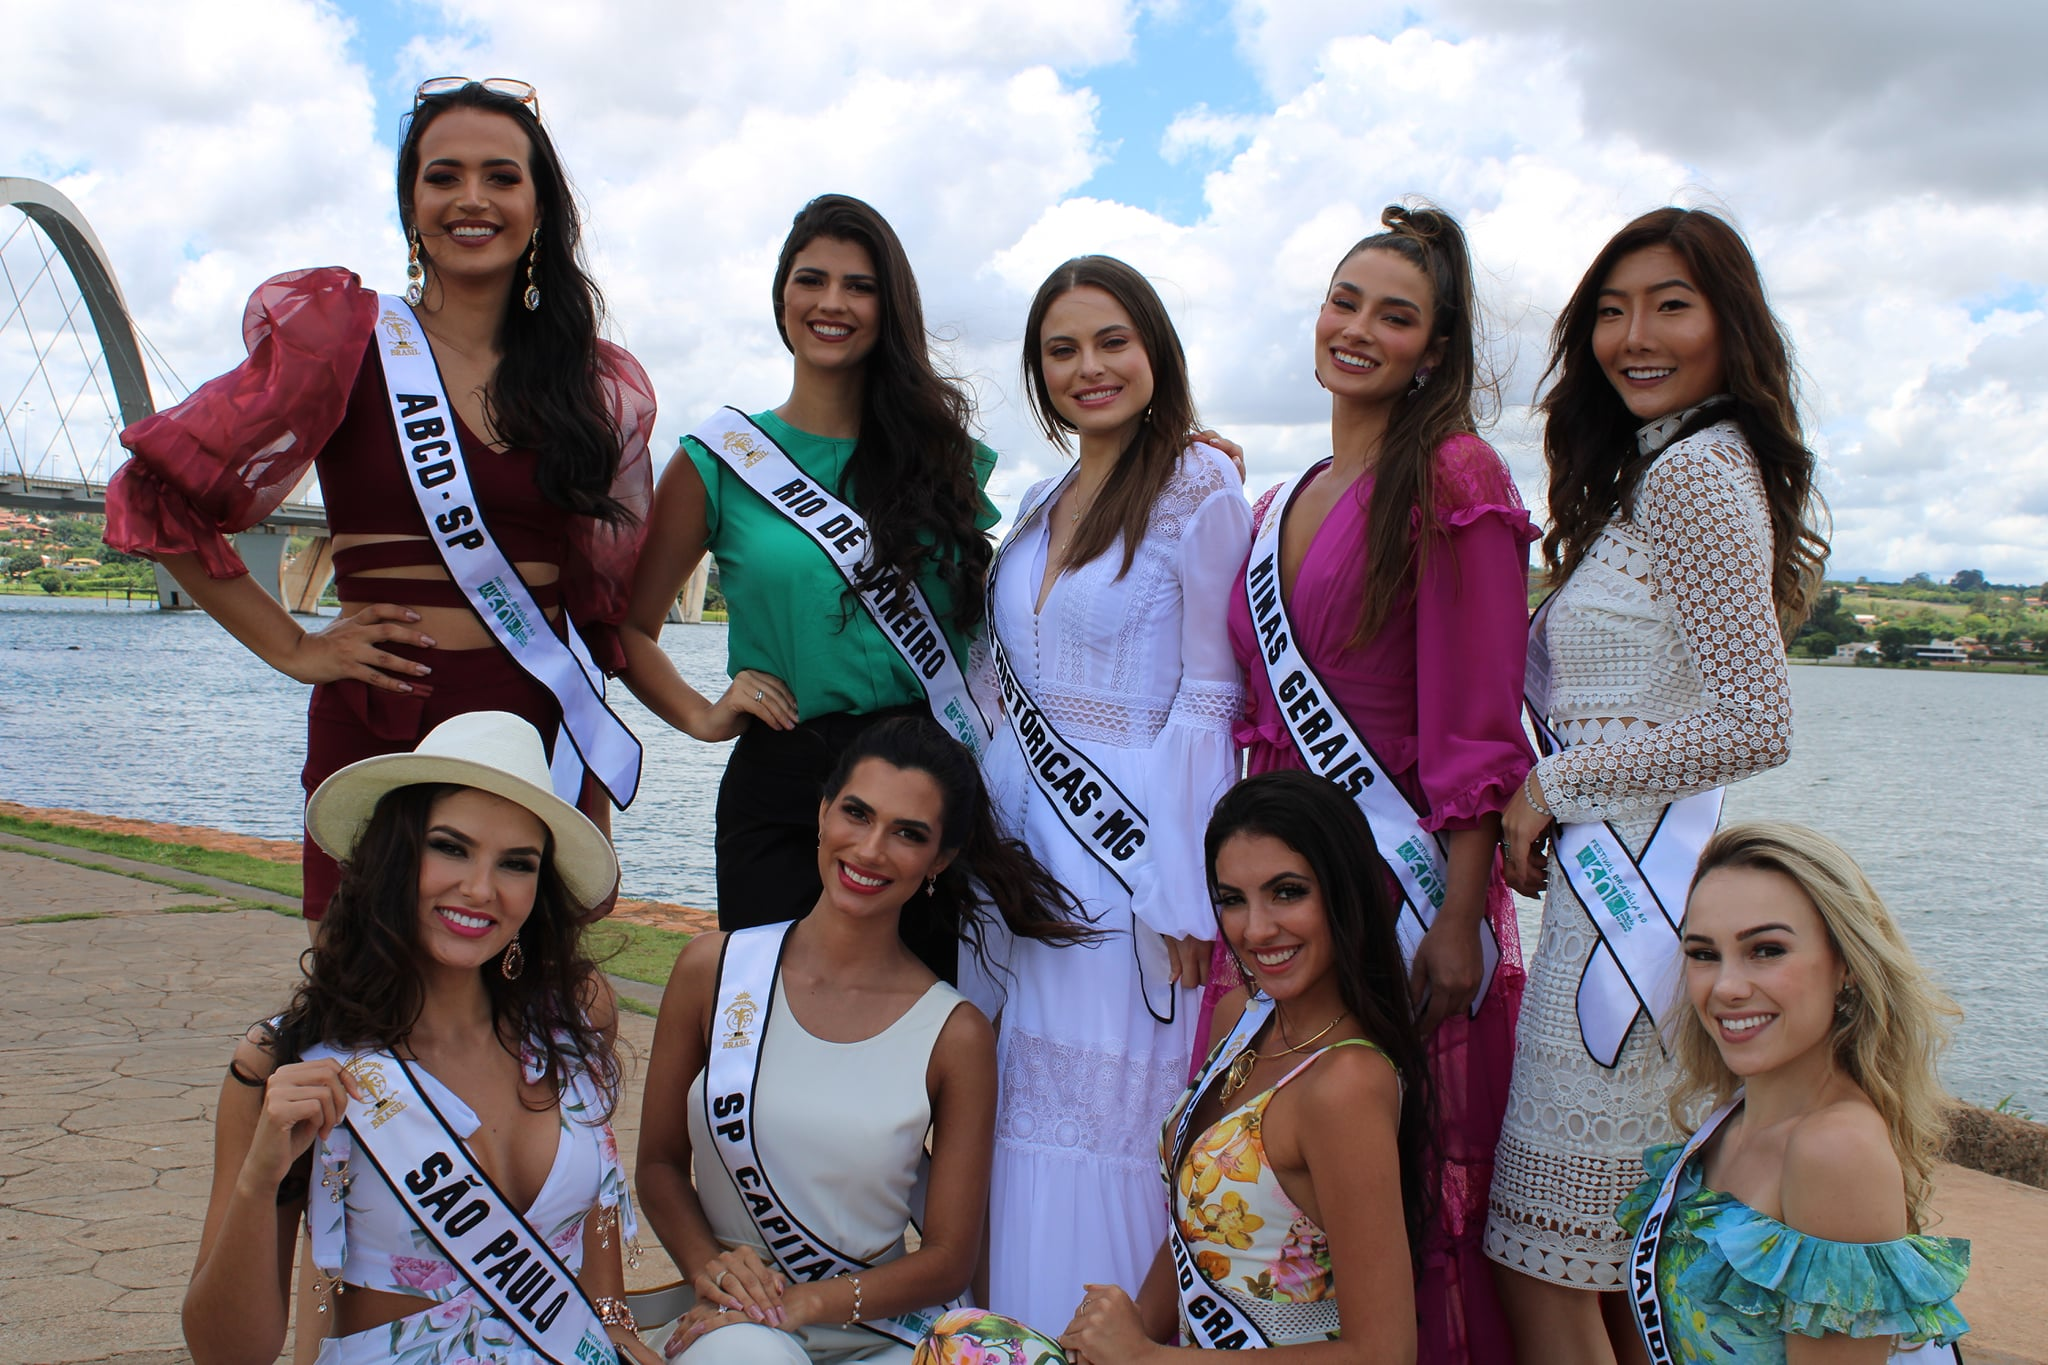 cristielli camargo, miss brasil mesoamerica 2021/top 13 de miss supranational brazil 2020/top 21 de miss brasil mundo 2018. - Página 4 12635510